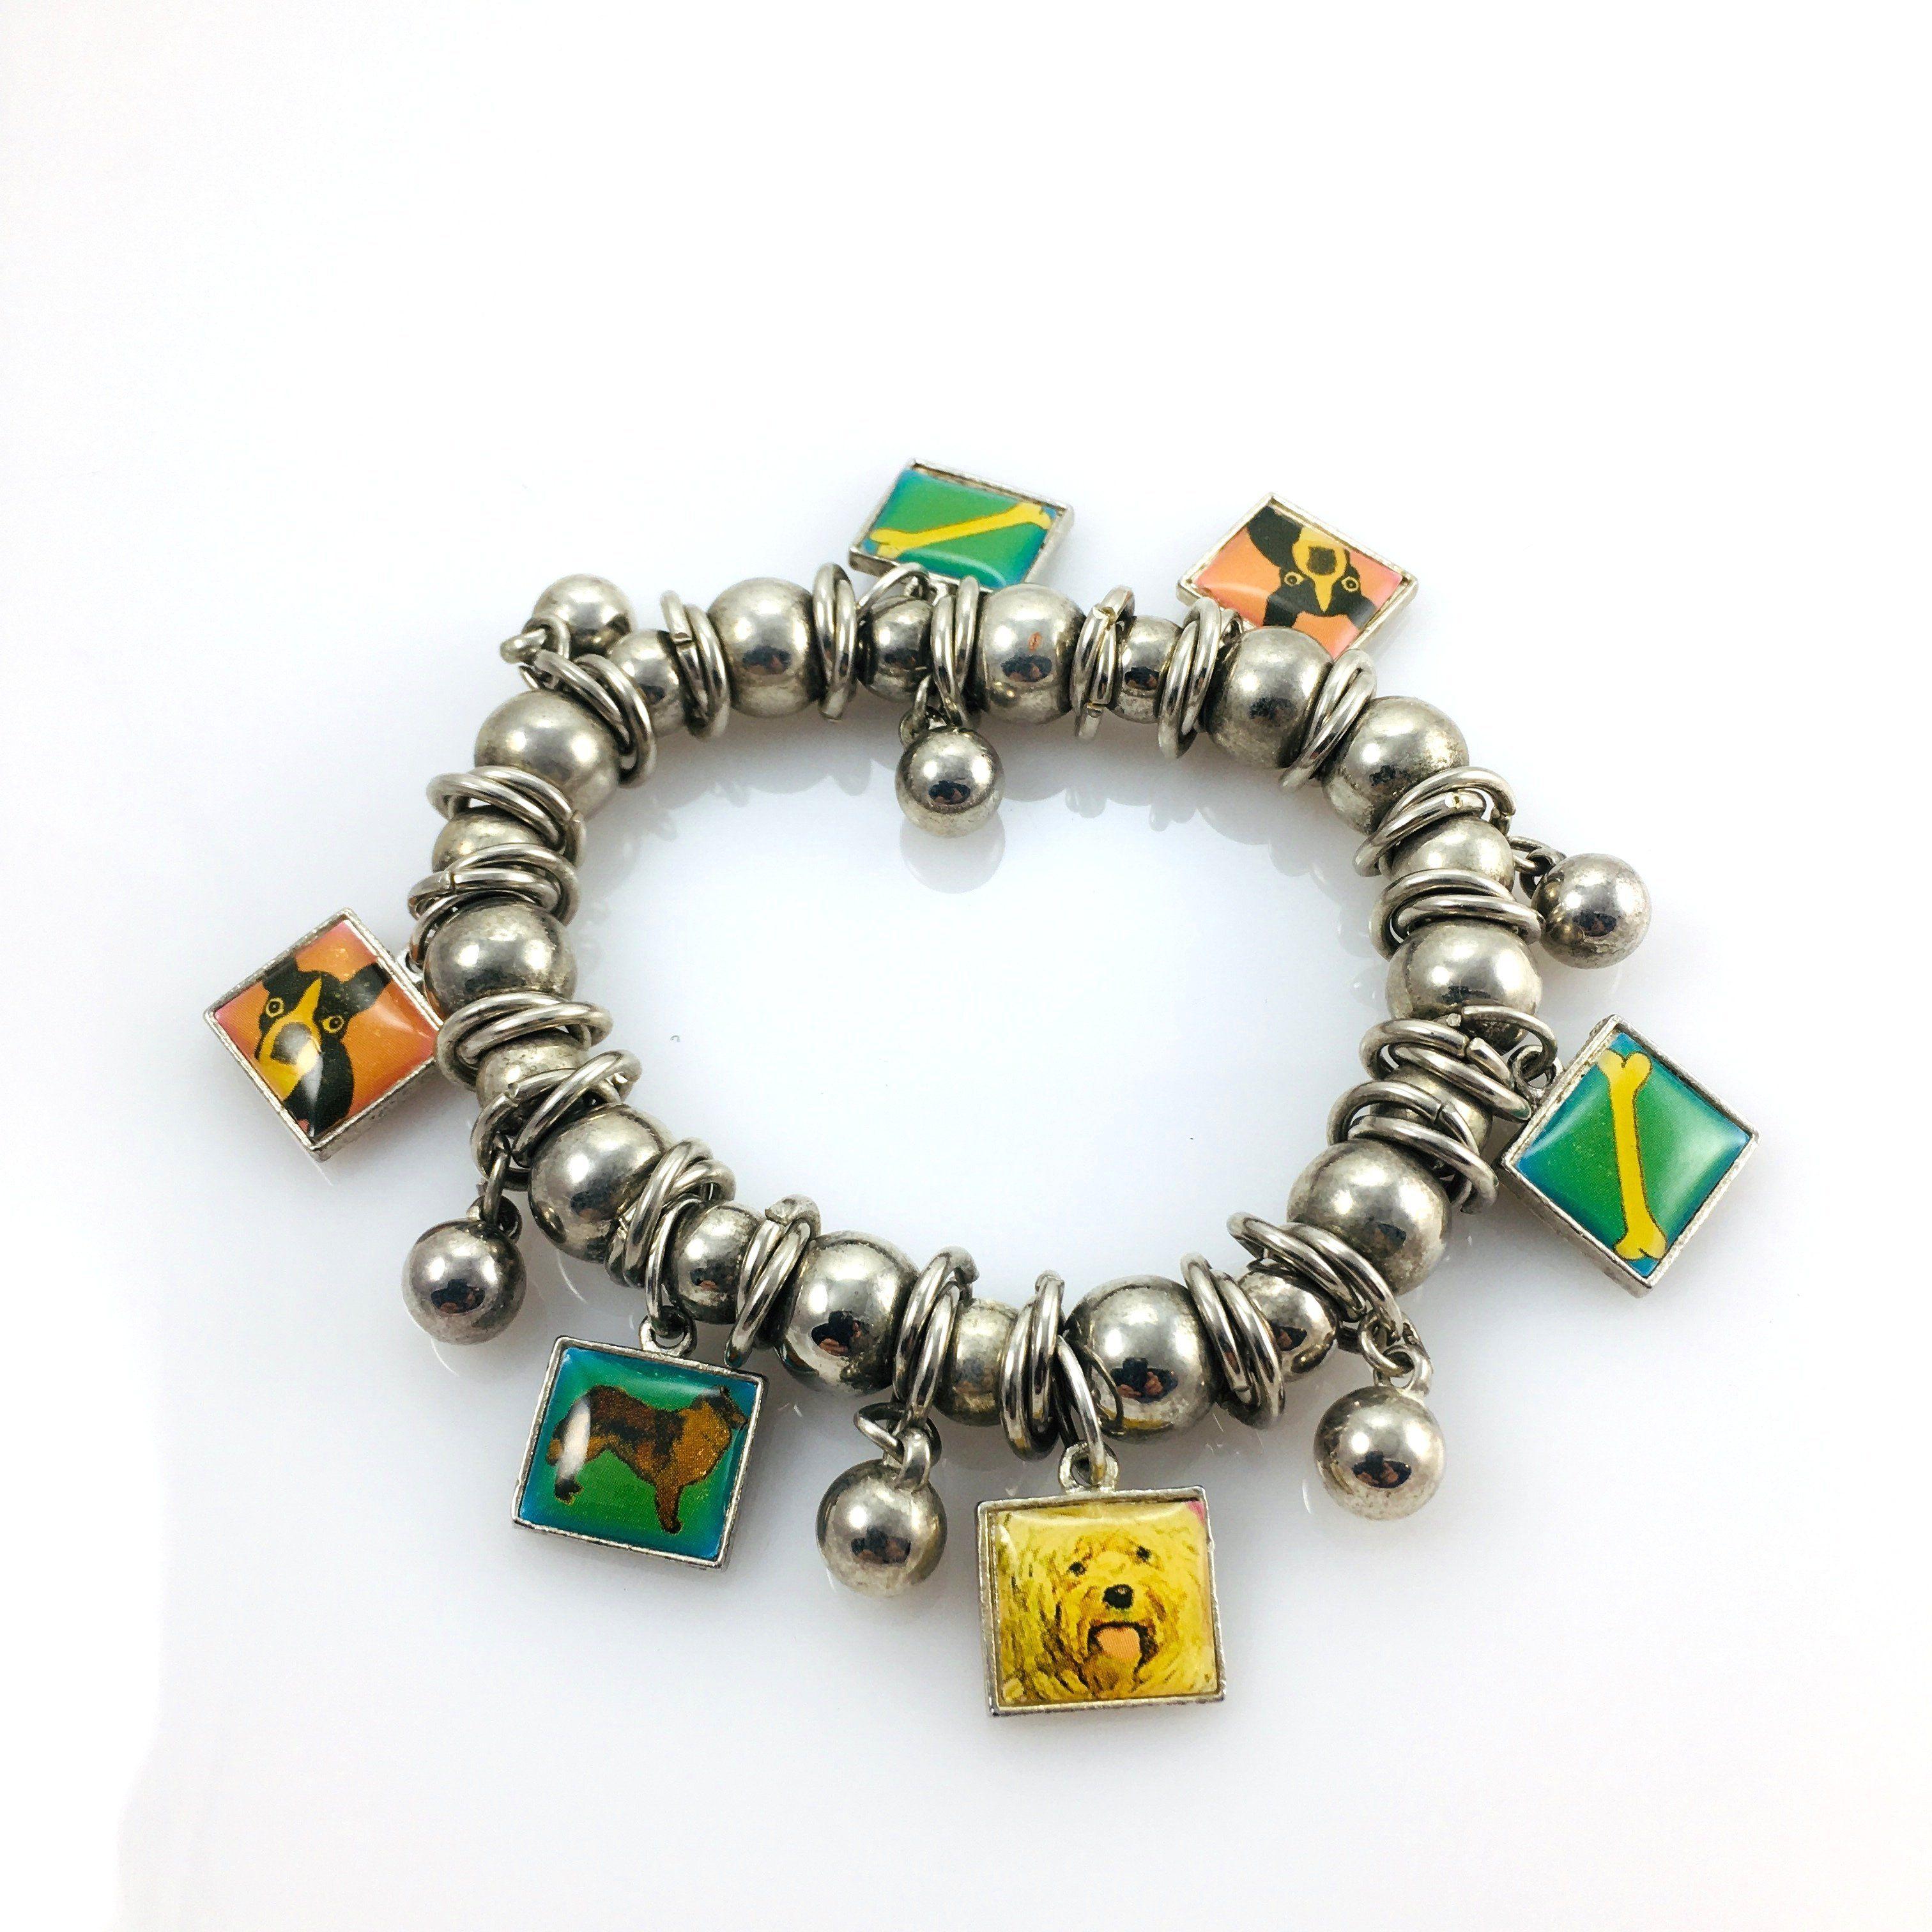 50pc Retro Tibetan Silver DOG Charm Beads Pendant Findings wholesale R529Q